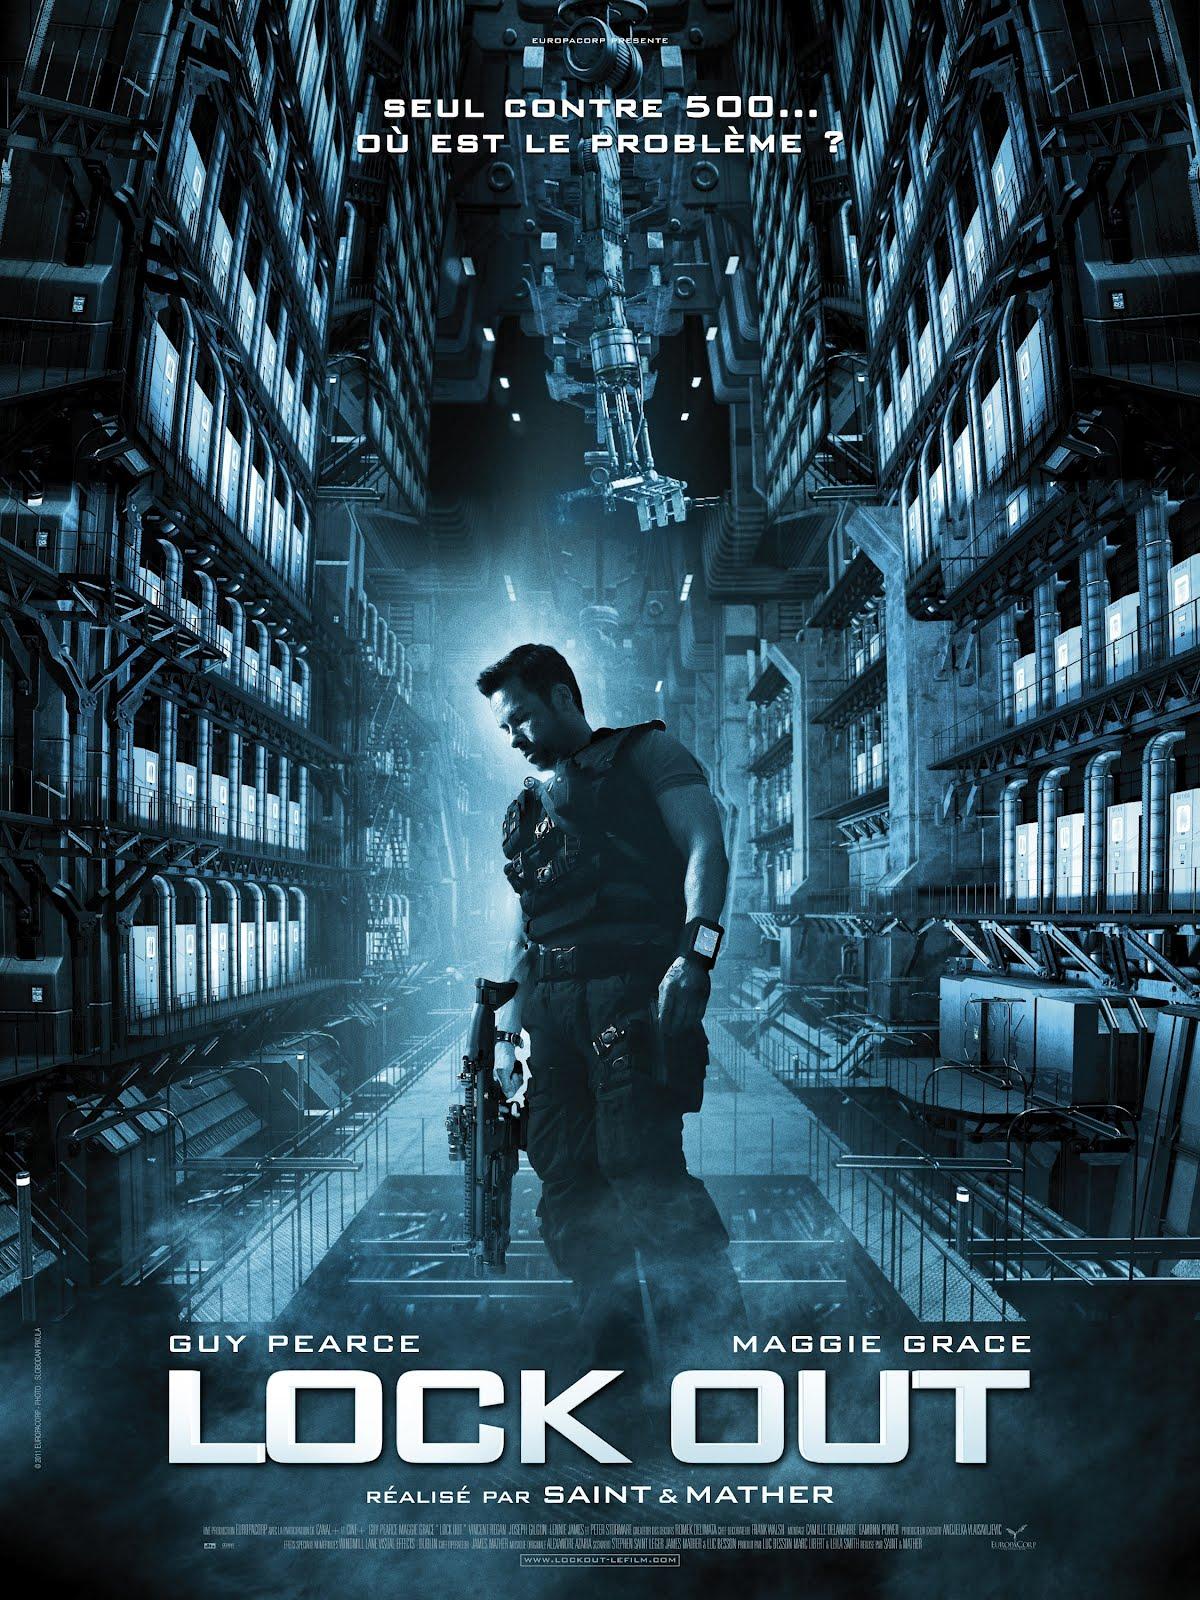 http://1.bp.blogspot.com/-eYydiR4rv9I/T4W3kG9uEtI/AAAAAAAAFd0/CjJNJfv4jsM/s1600/Lockout+French+Poster.jpg